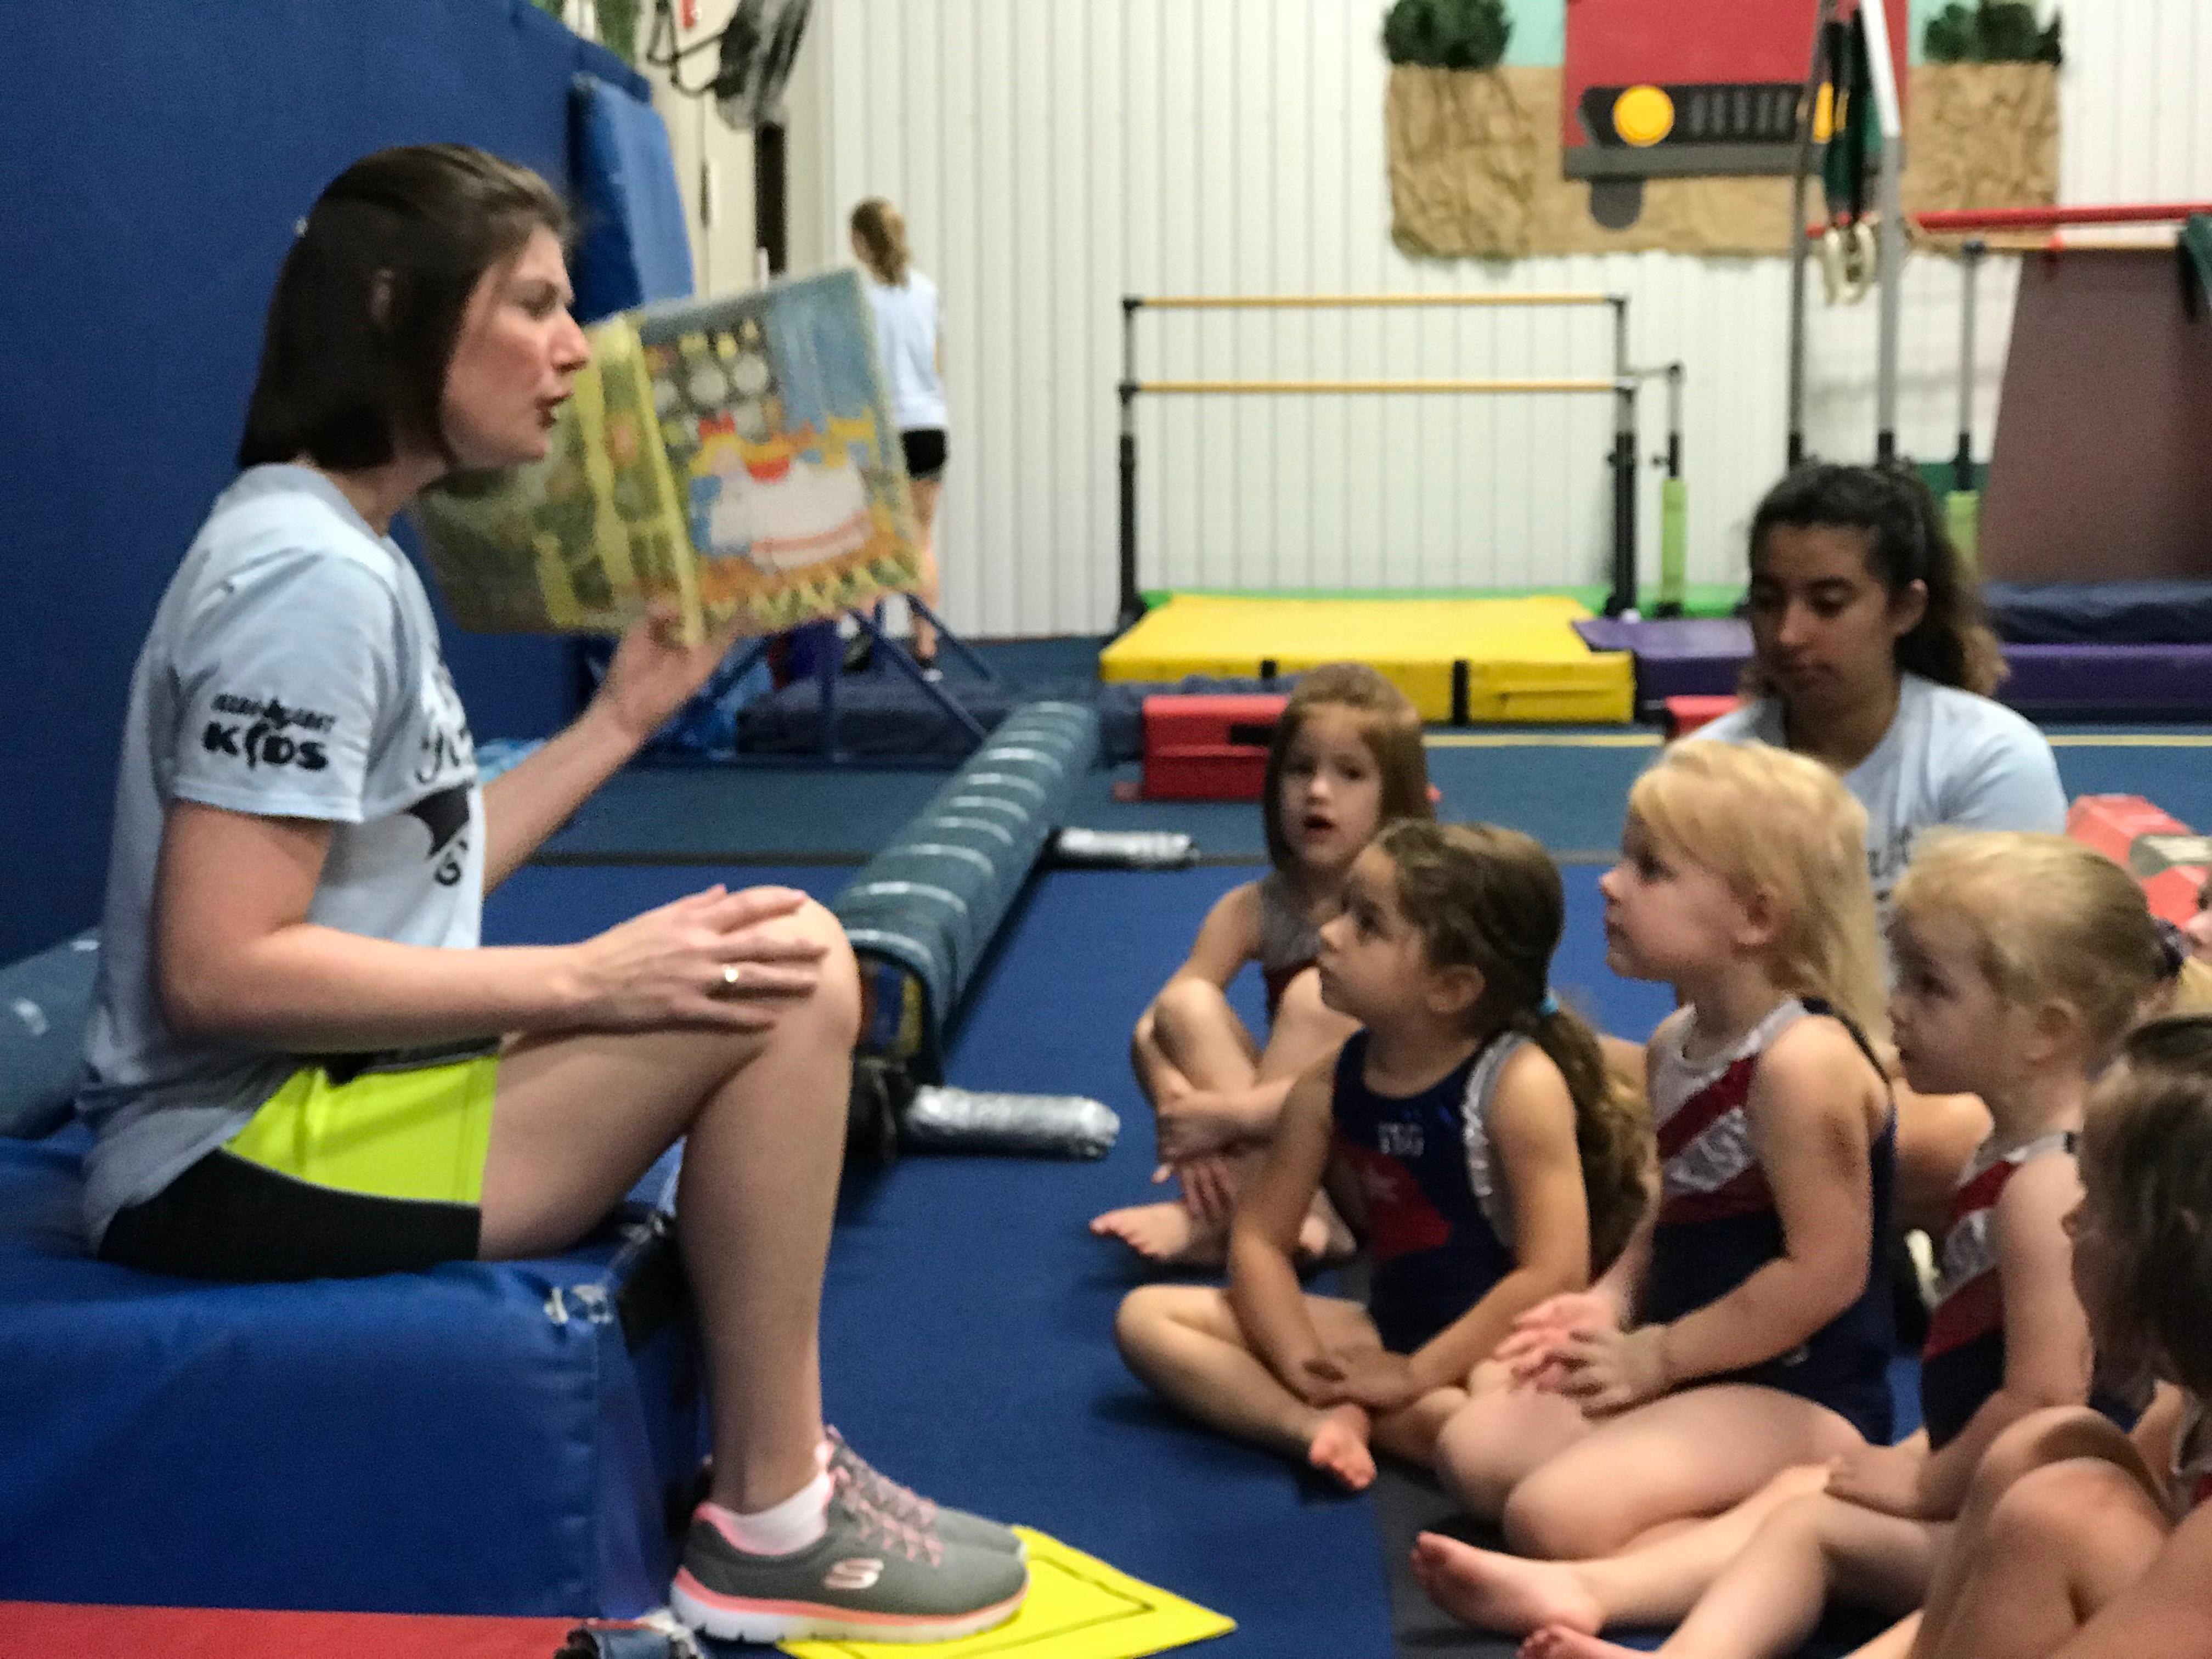 Texas East Gymnastics image 21